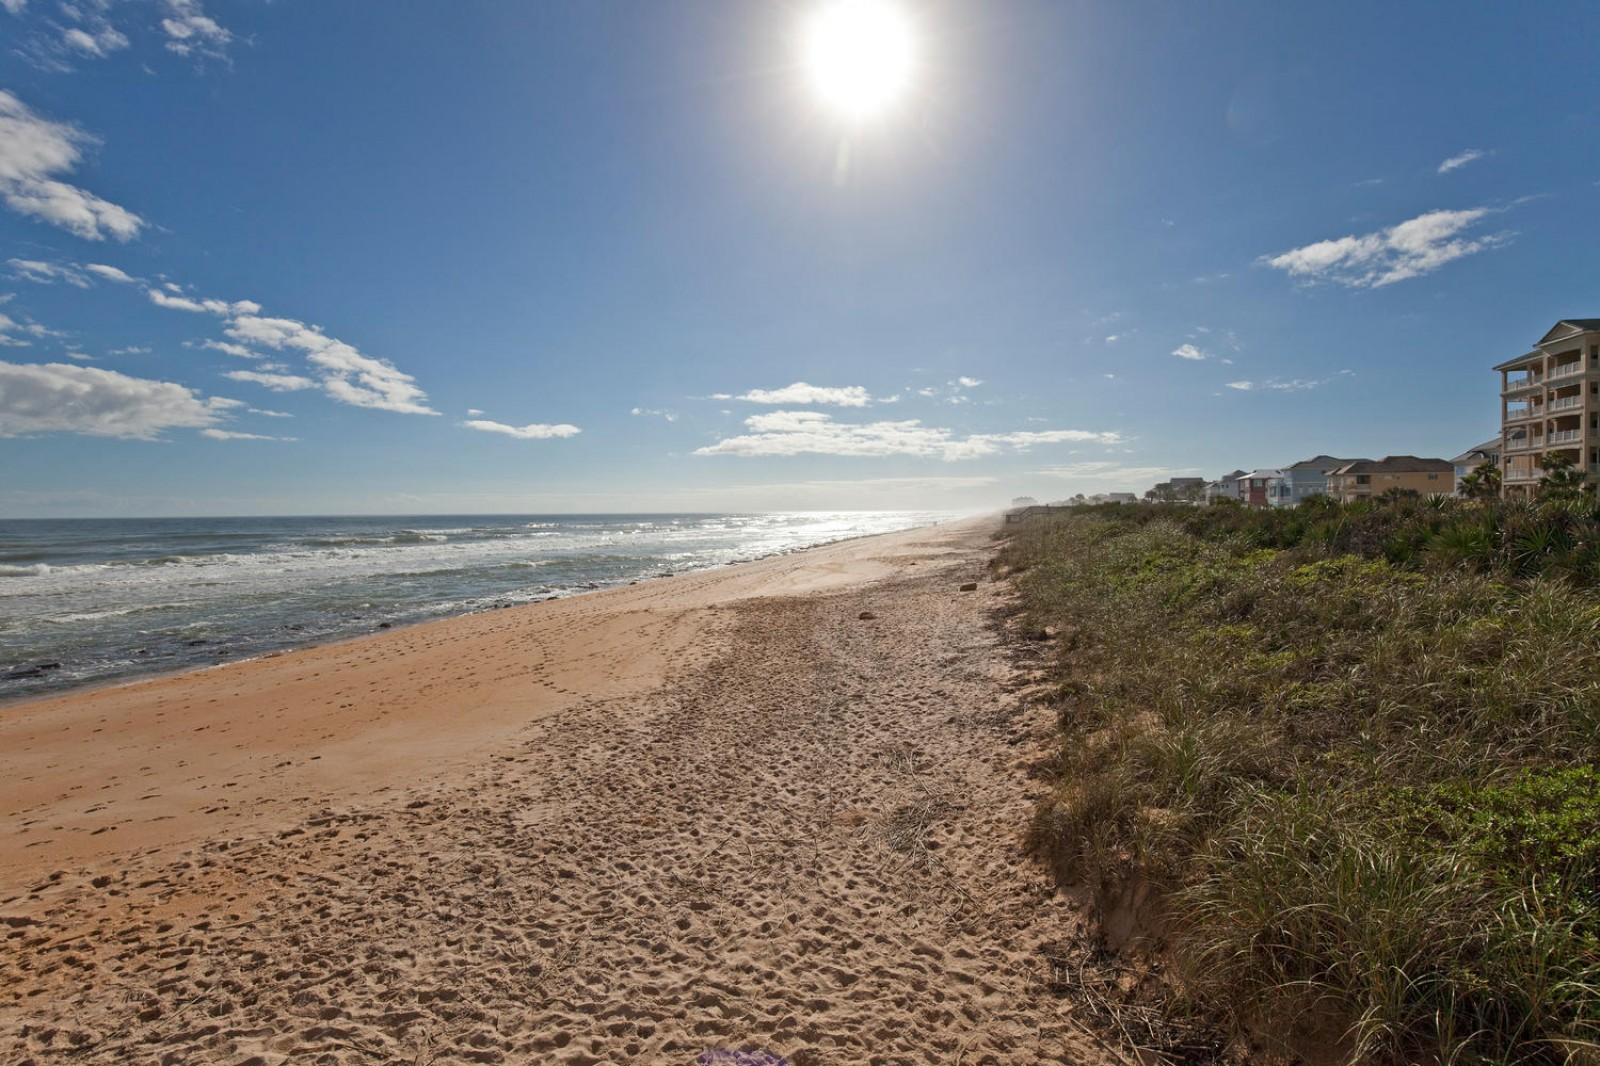 Waterfront Real Estate Cinnamon Beach